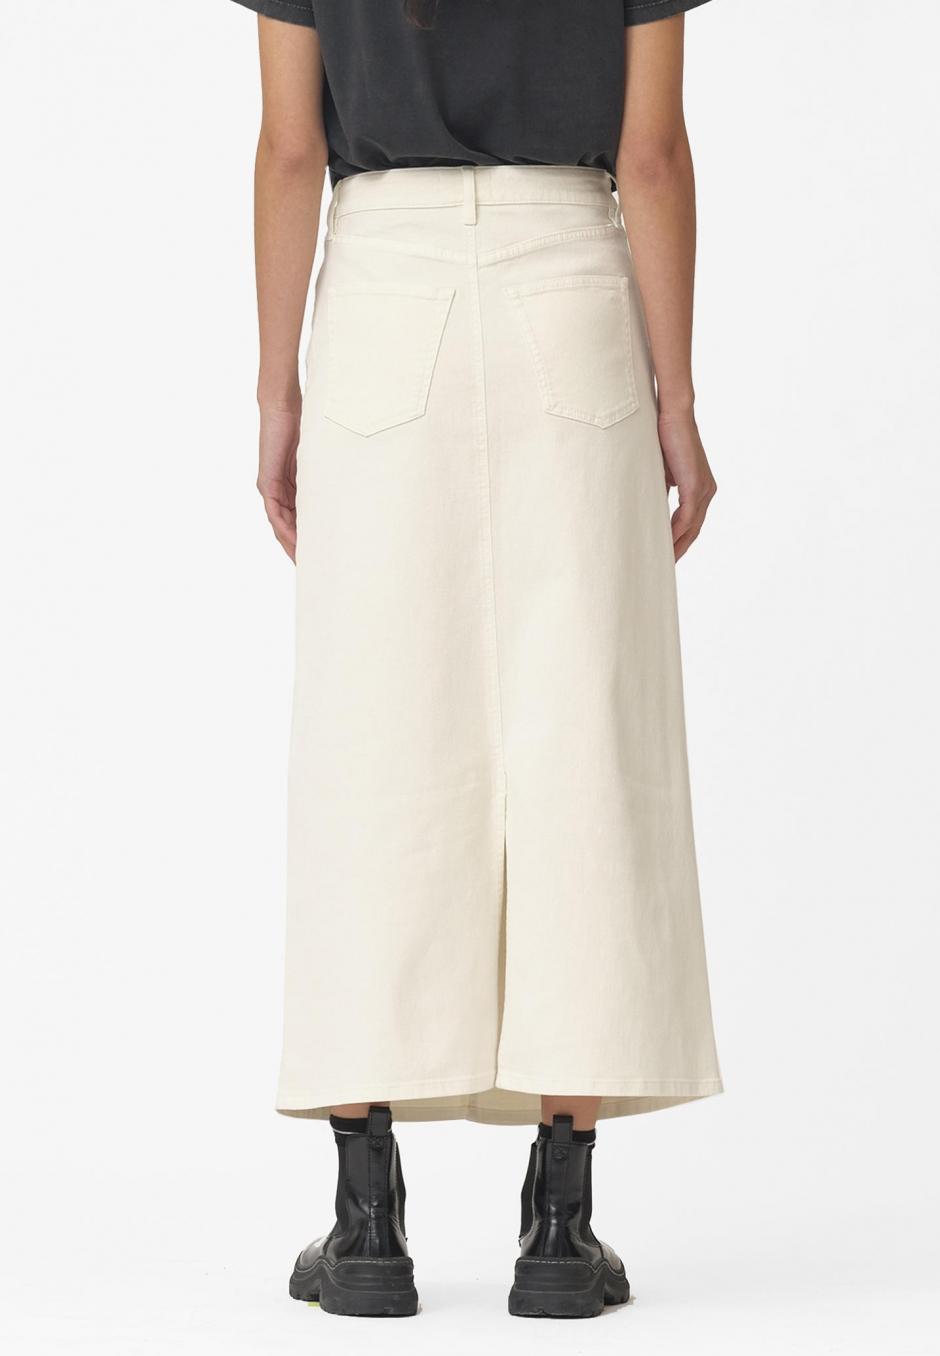 Ivy Zoe Long Skirt Ecru